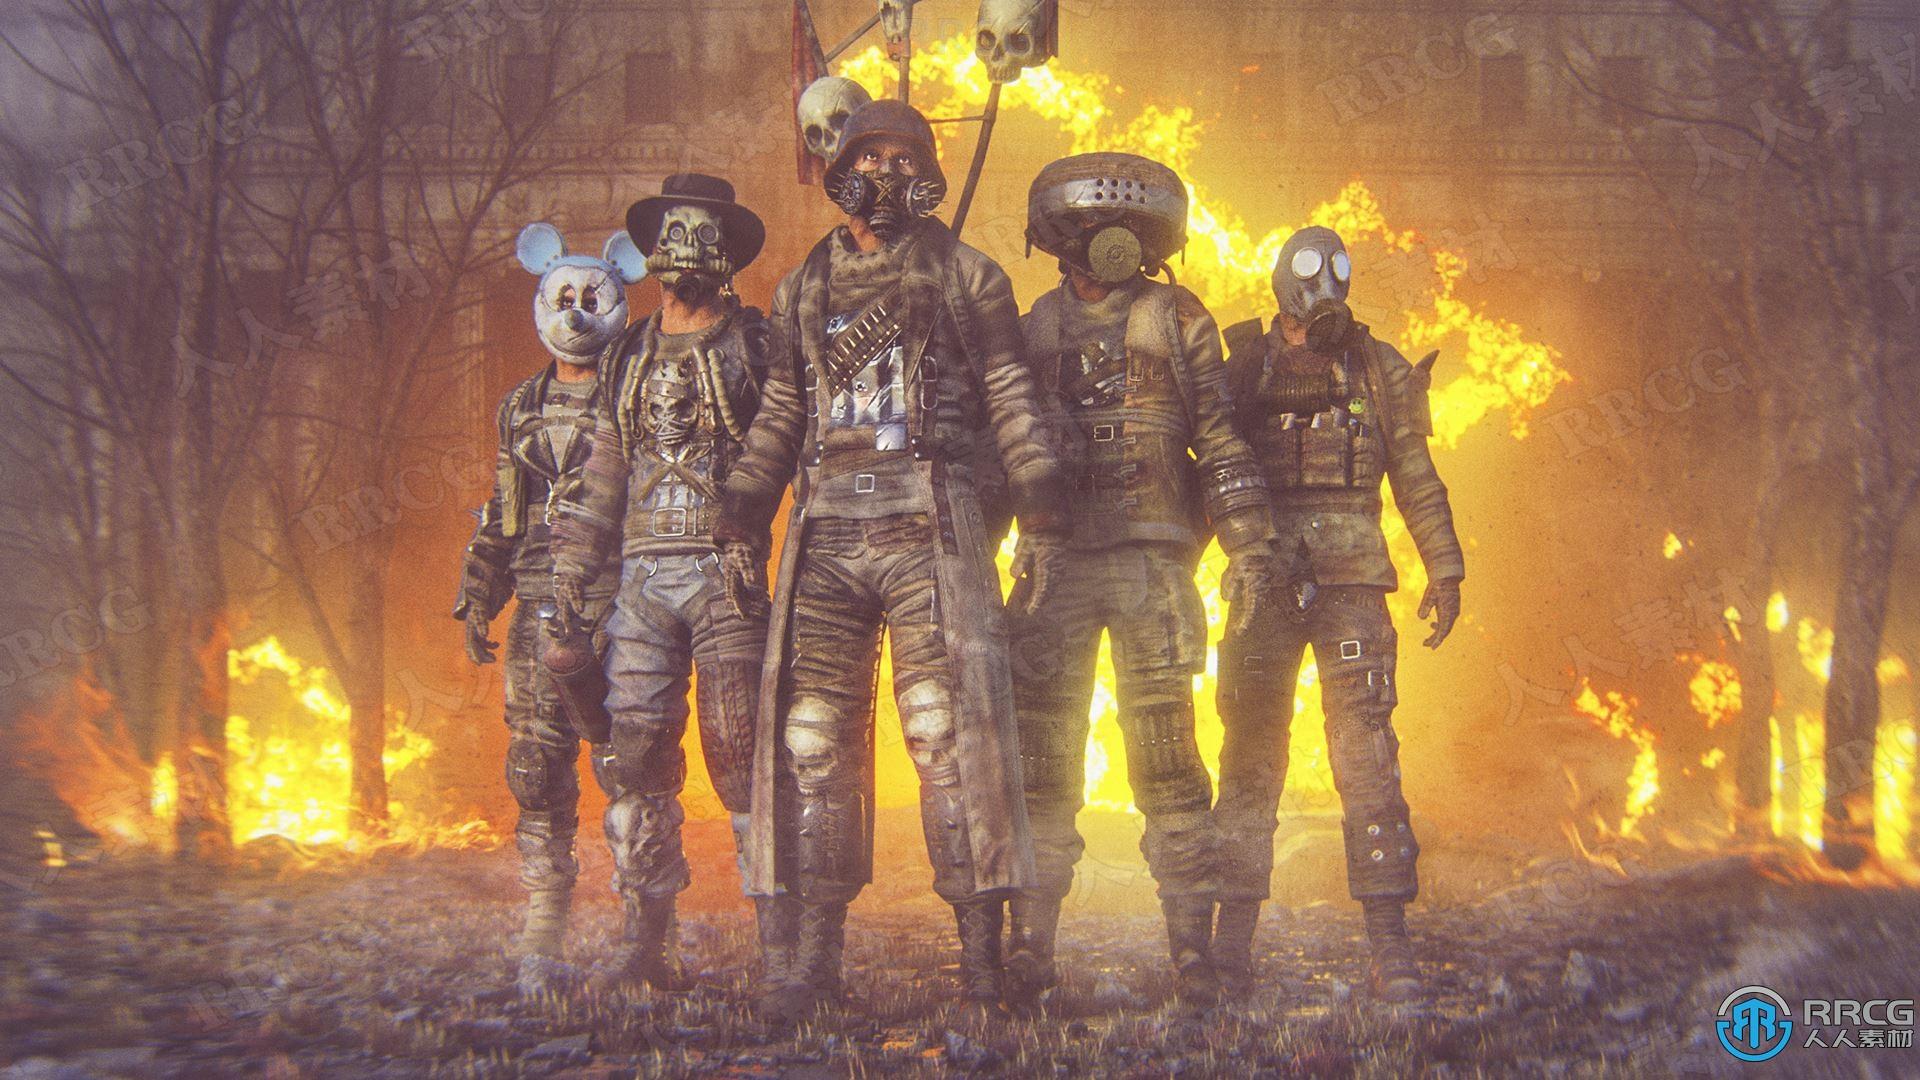 43件衣服武器自由组装角色Unreal Engine游戏素材资源